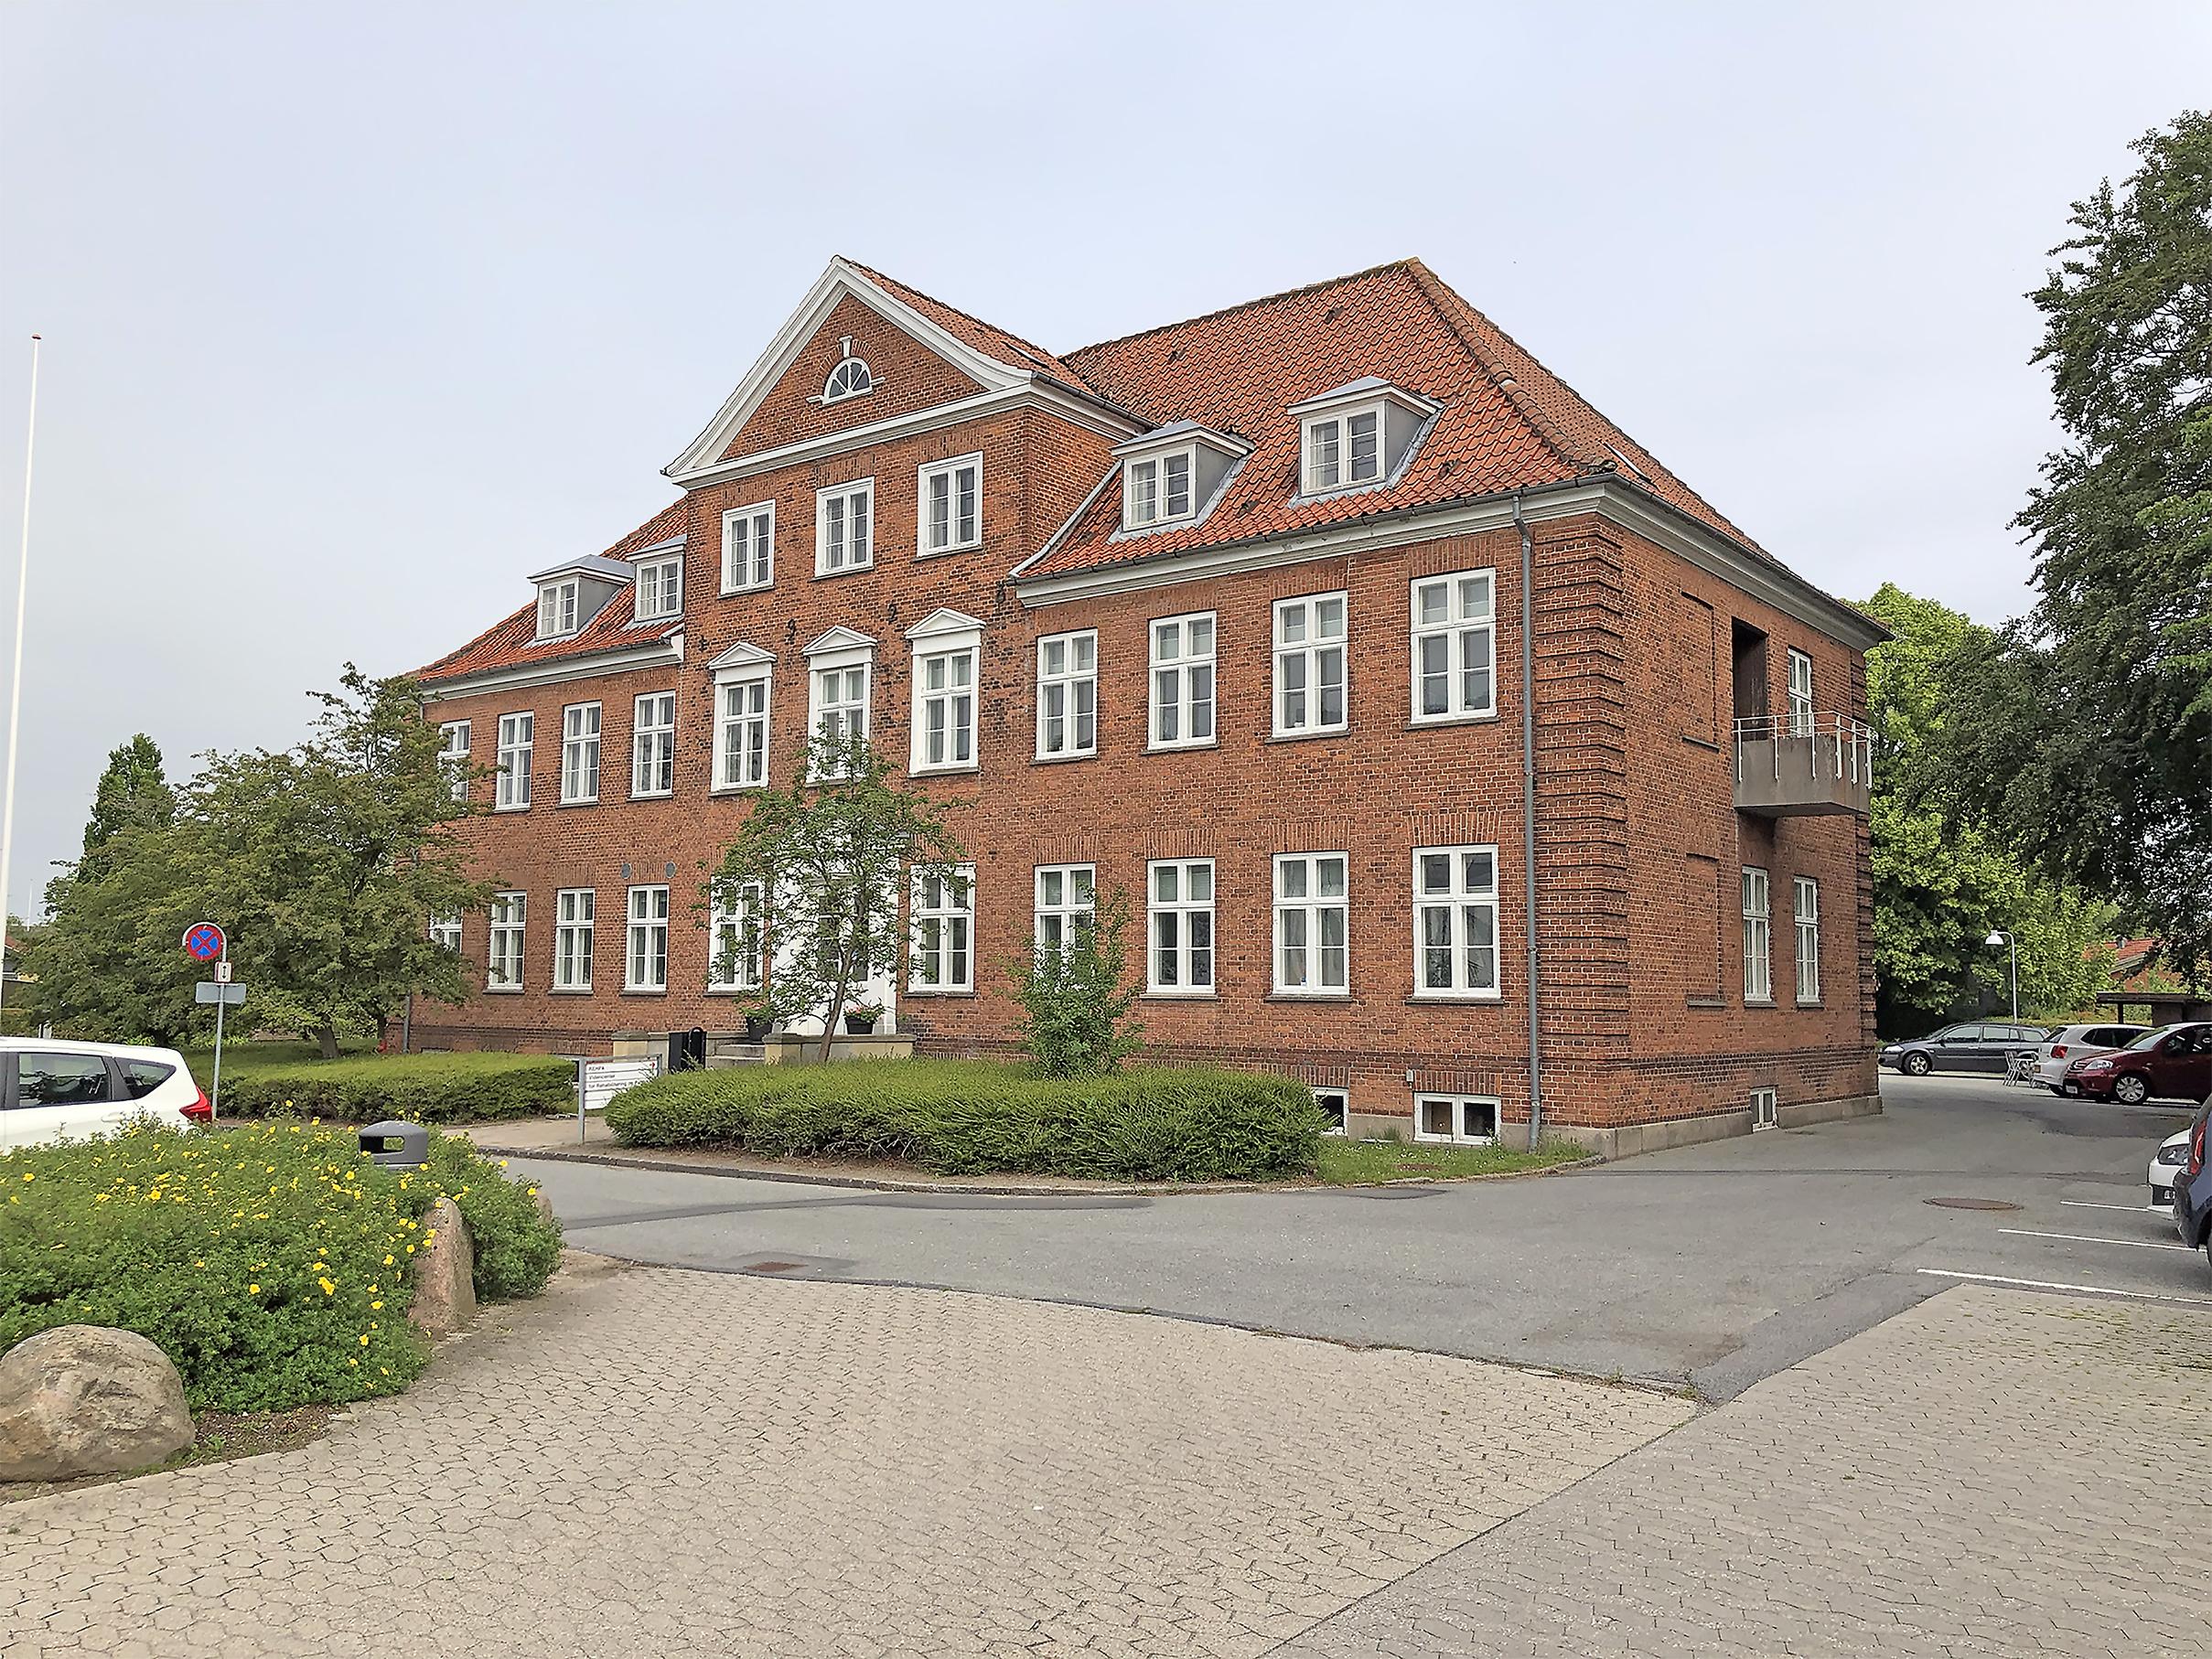 Odense Universitetshospital